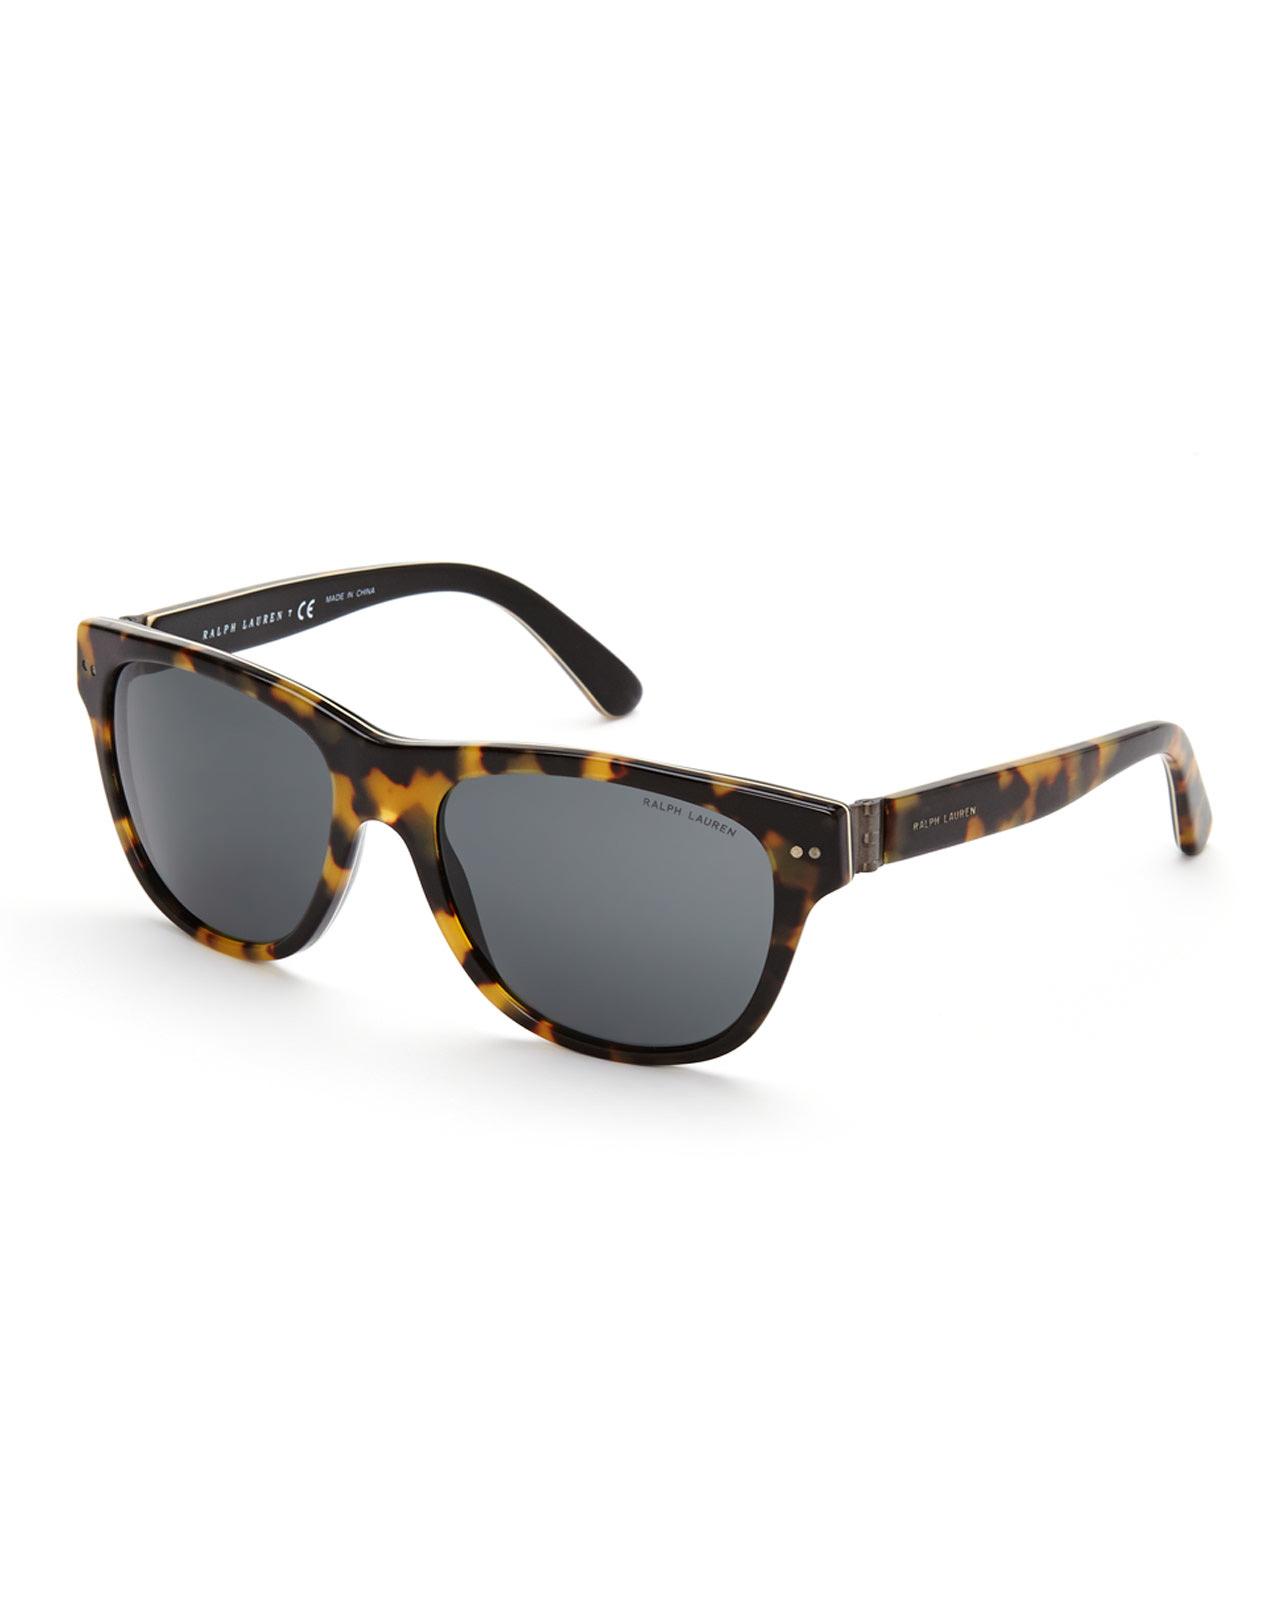 Ralph Lauren Ricky Sunglasses  ralph lauren ph 4080 tortoises look wayfarer sunglasses in